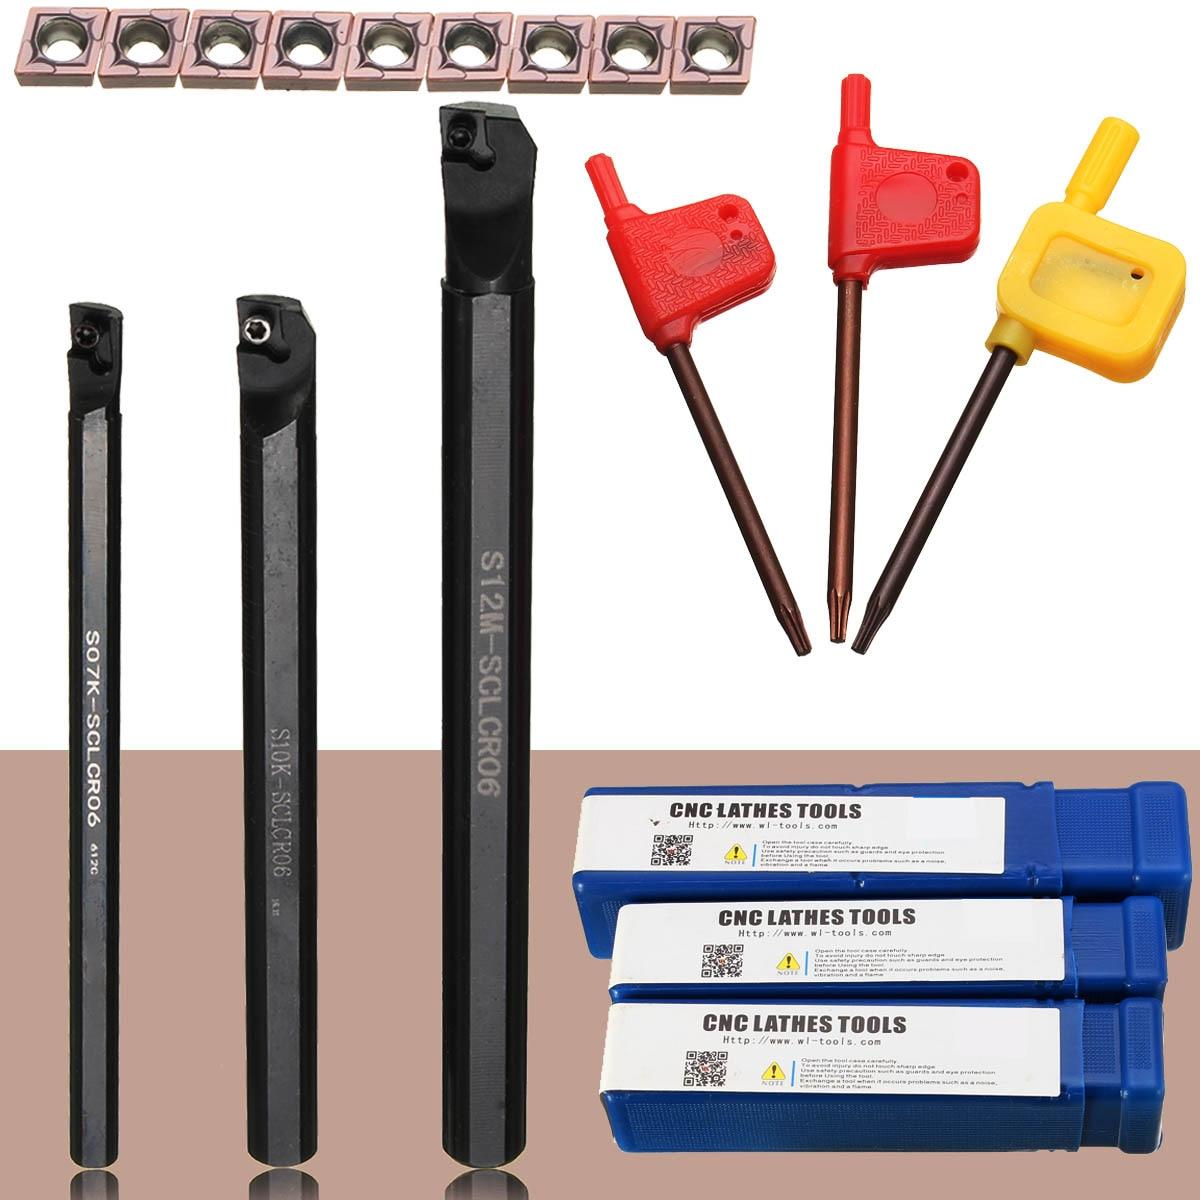 1pcs S07K-SCLCR06+1pcs S10K-SCLCR06+1pcs S12M-SCLCR06 Lathe Holder Turning Tool Boring Bar 7/10/12mm + 10pcs CCMT0602 Inserts